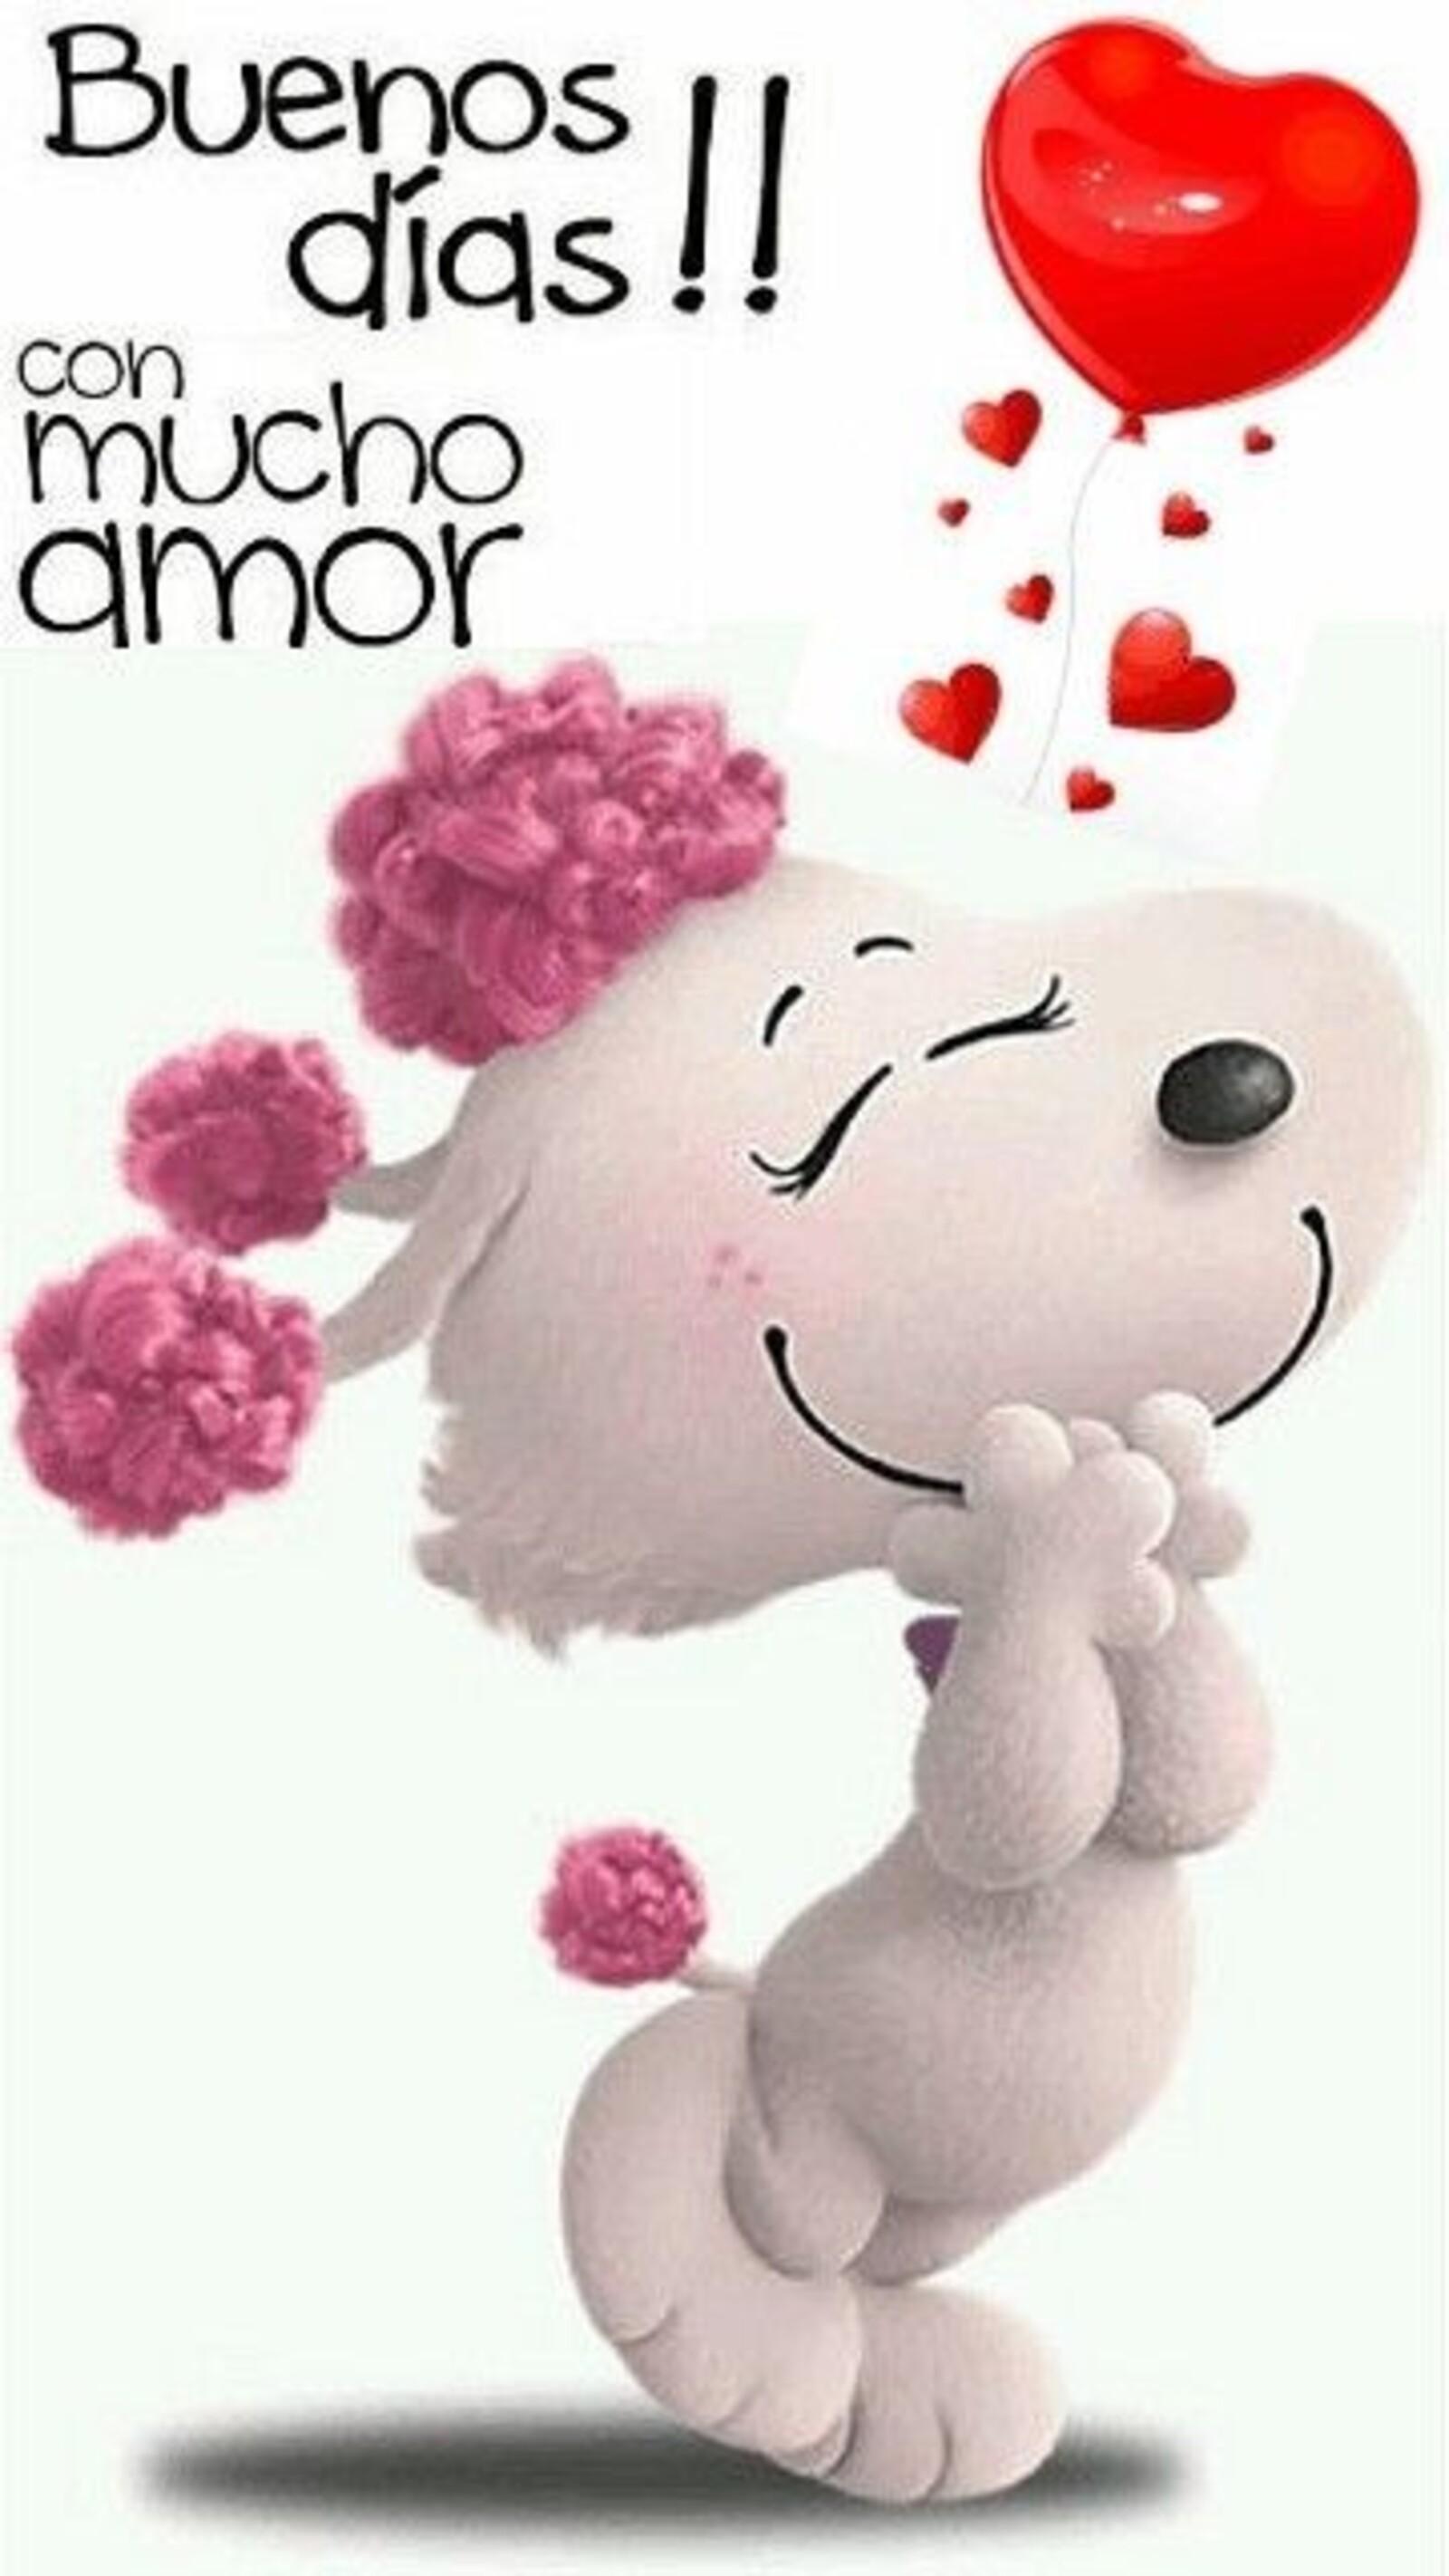 Buenos días!! con mucho amor